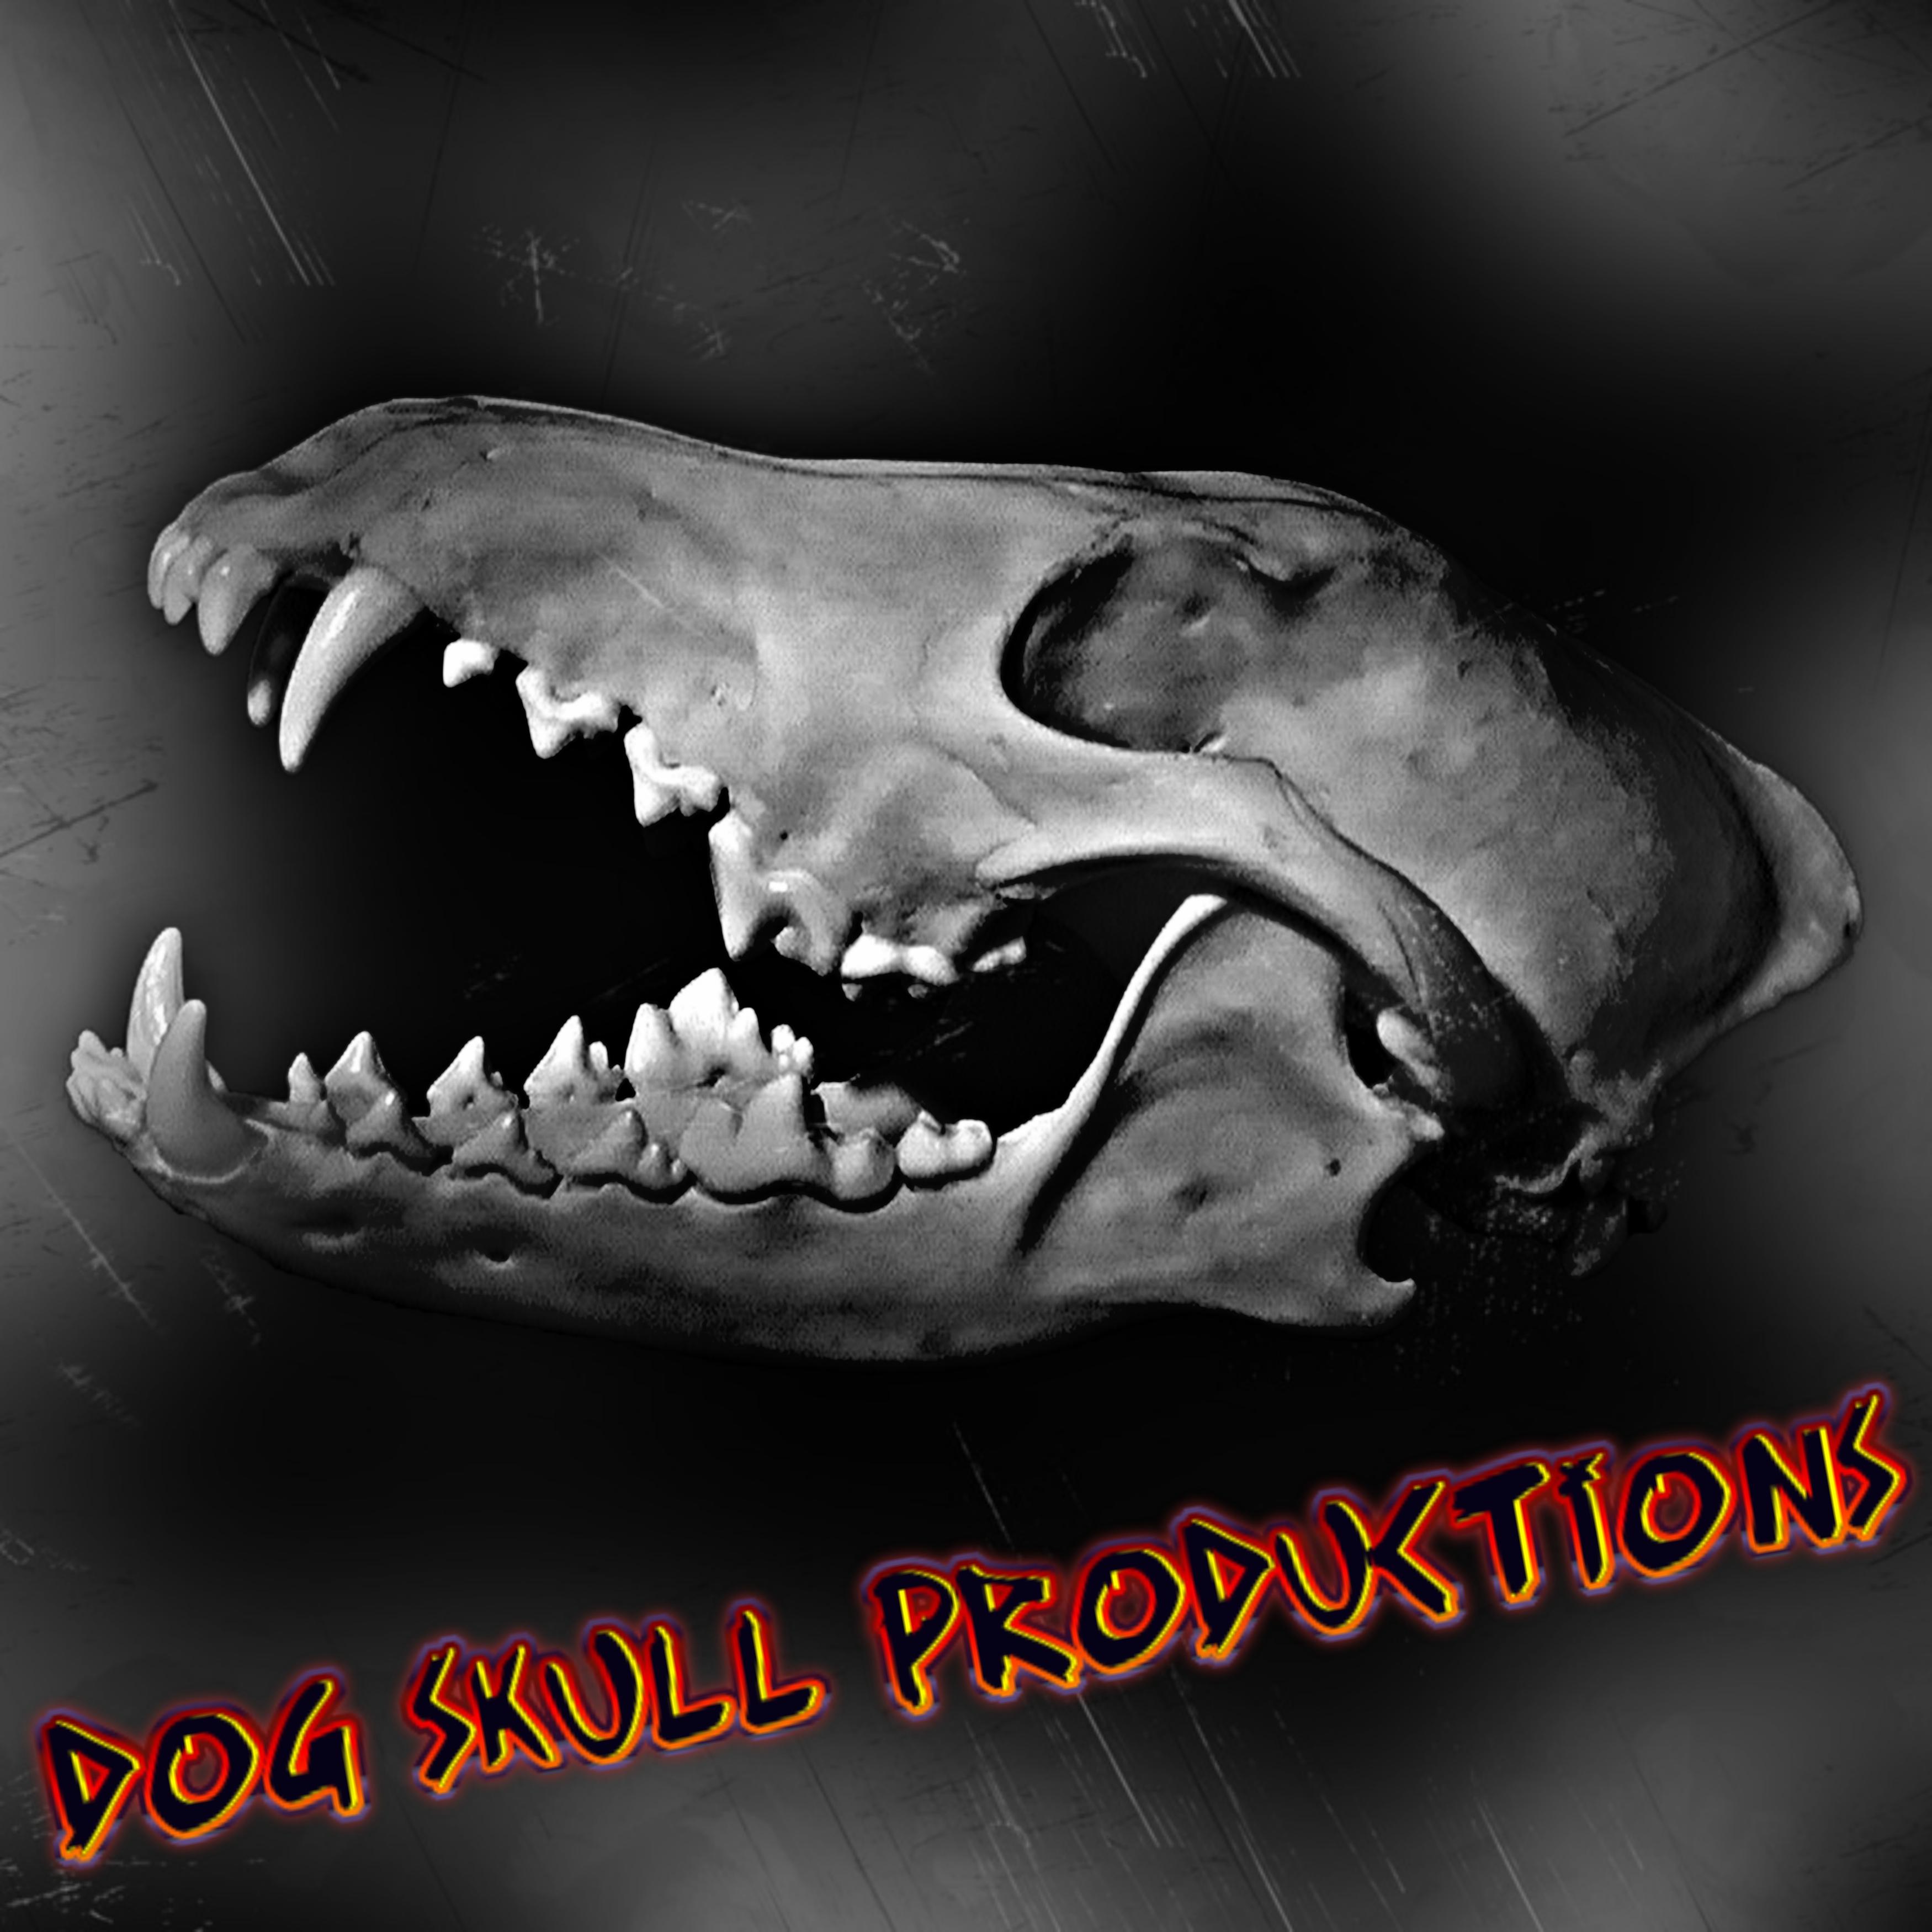 Dog Skull Productions logo